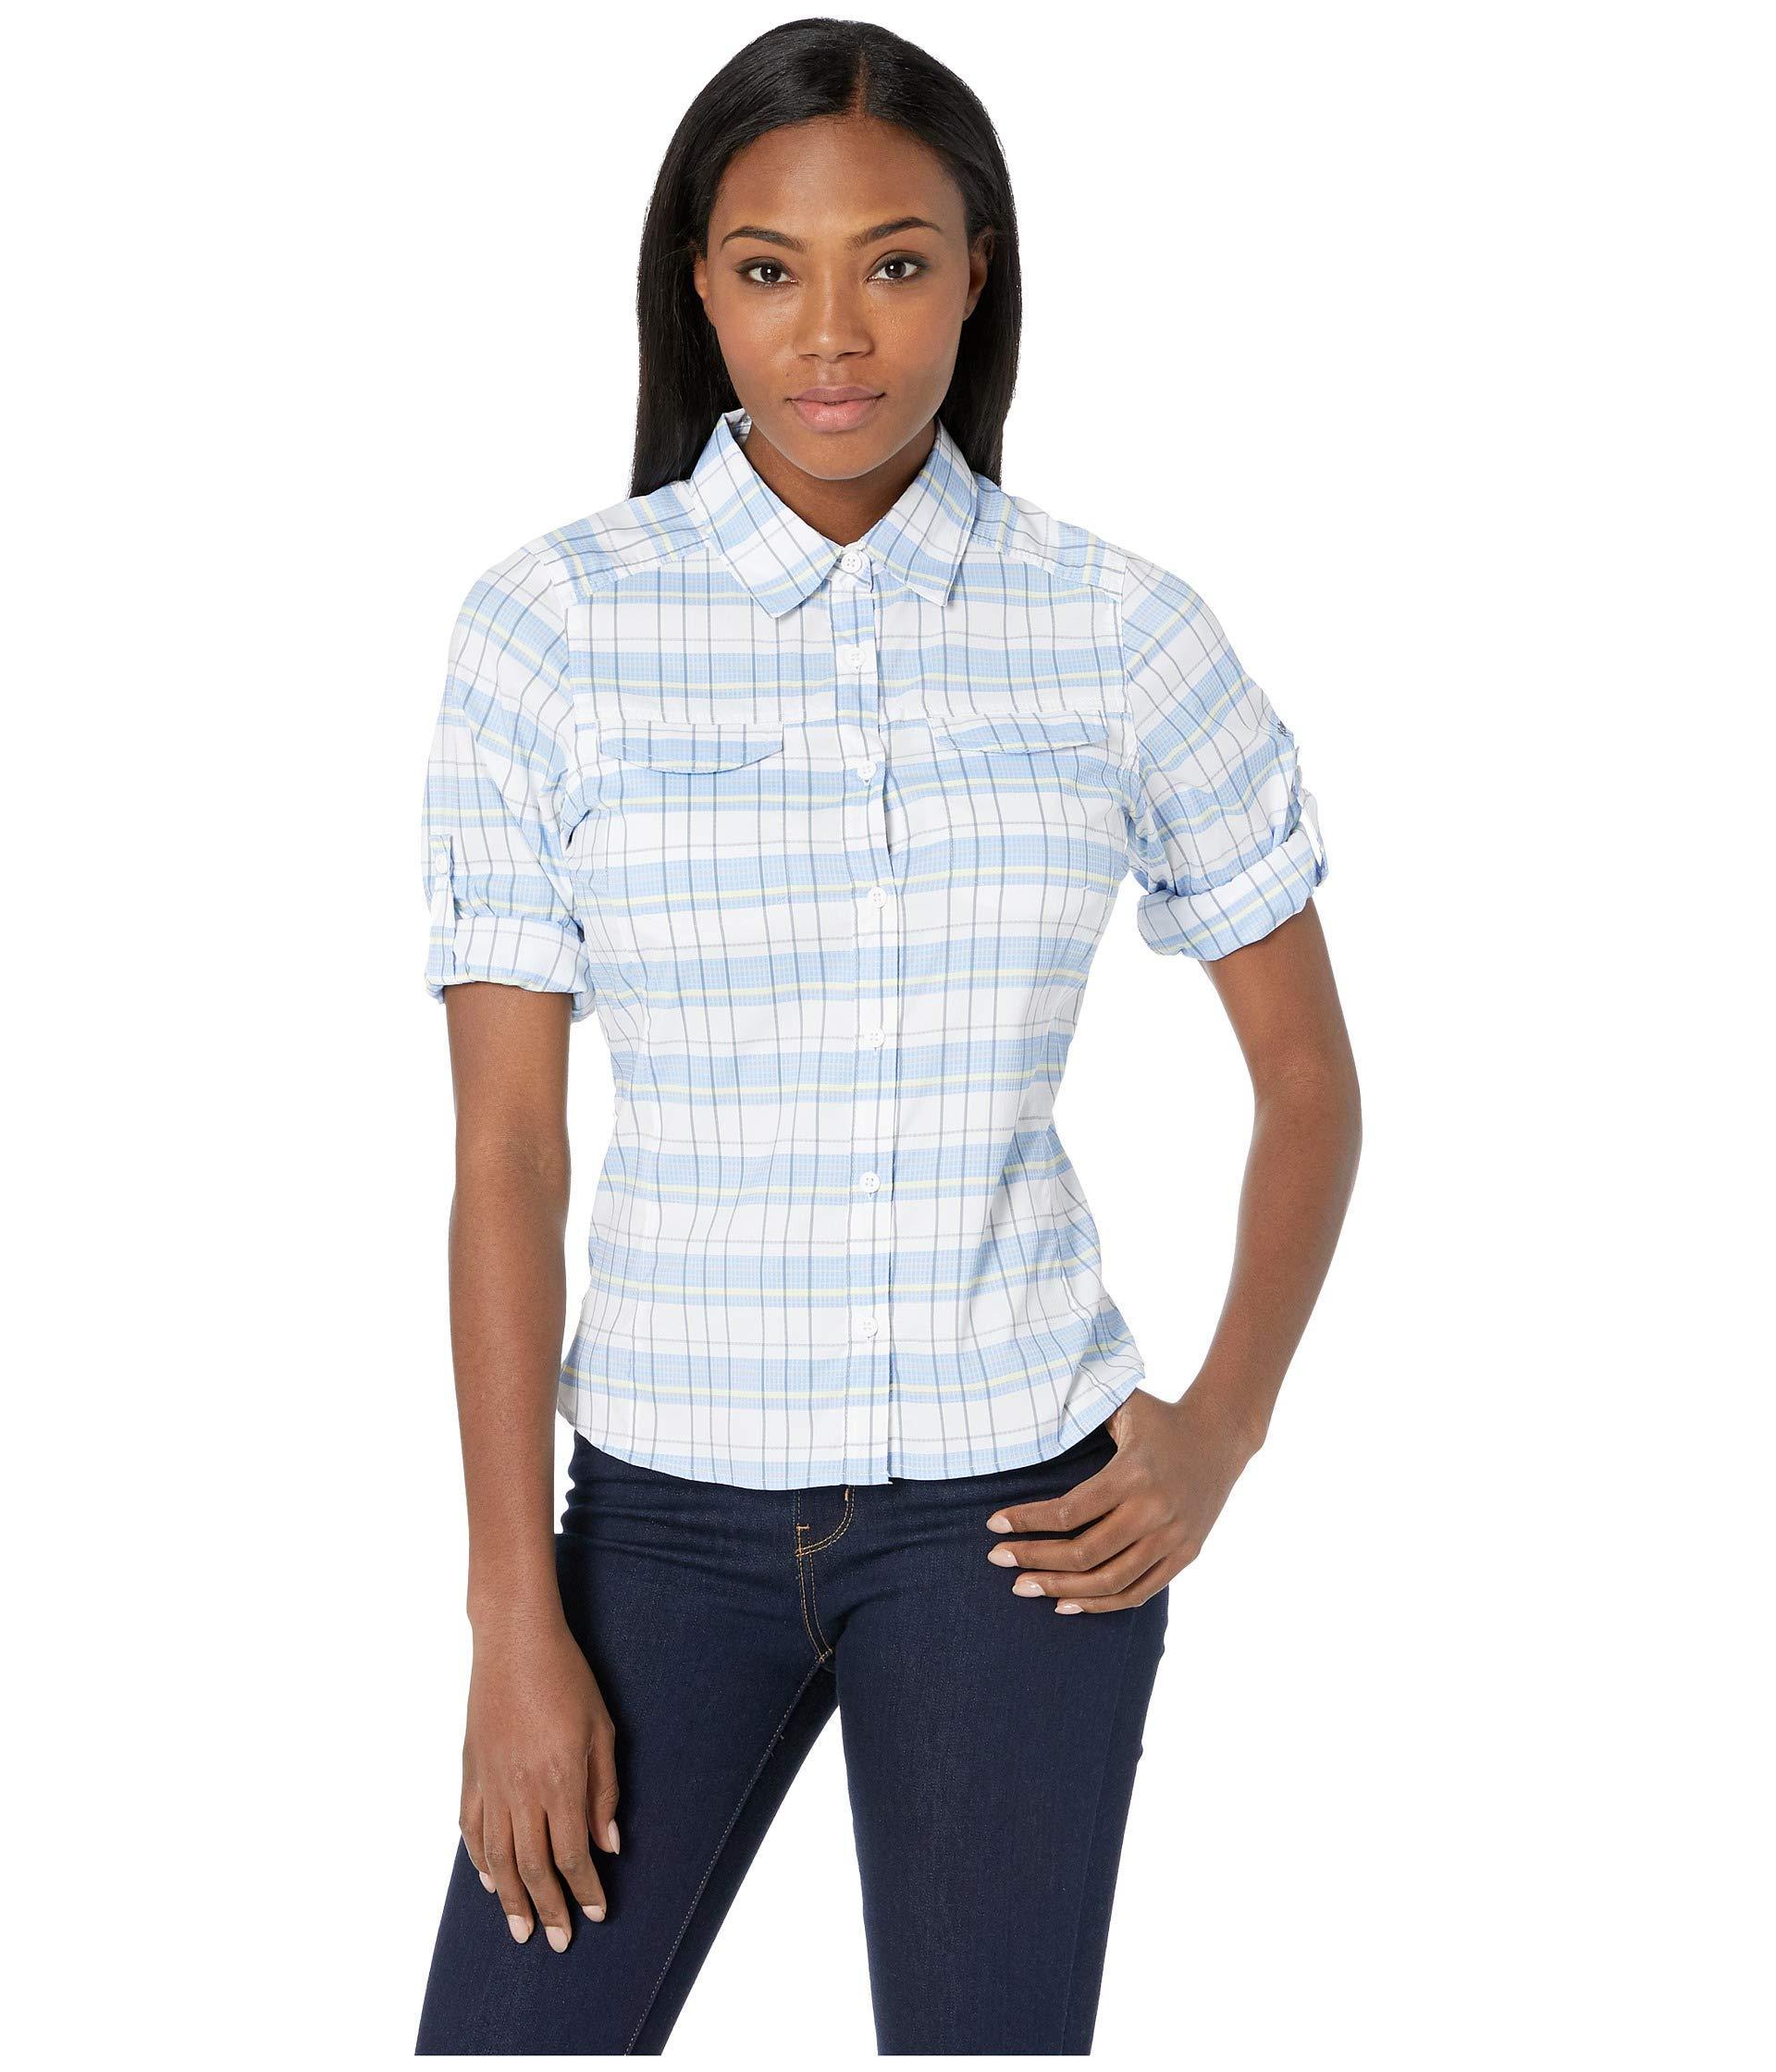 928f38e6ed0 Columbia Womens Silver Ridge Plaid Long Sleeve Shirt - DREAMWORKS